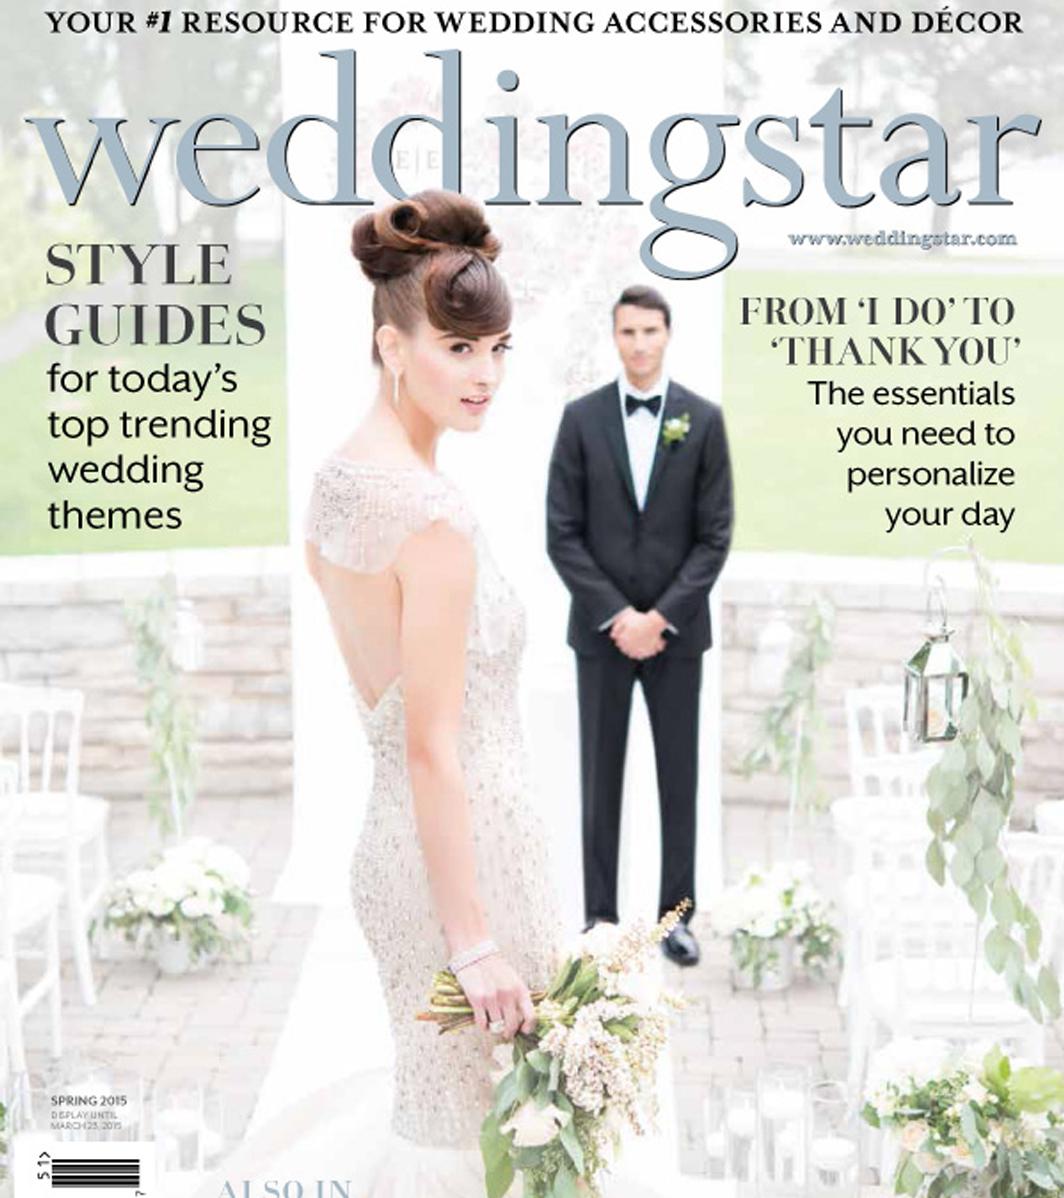 weddingstar 2015.jpg